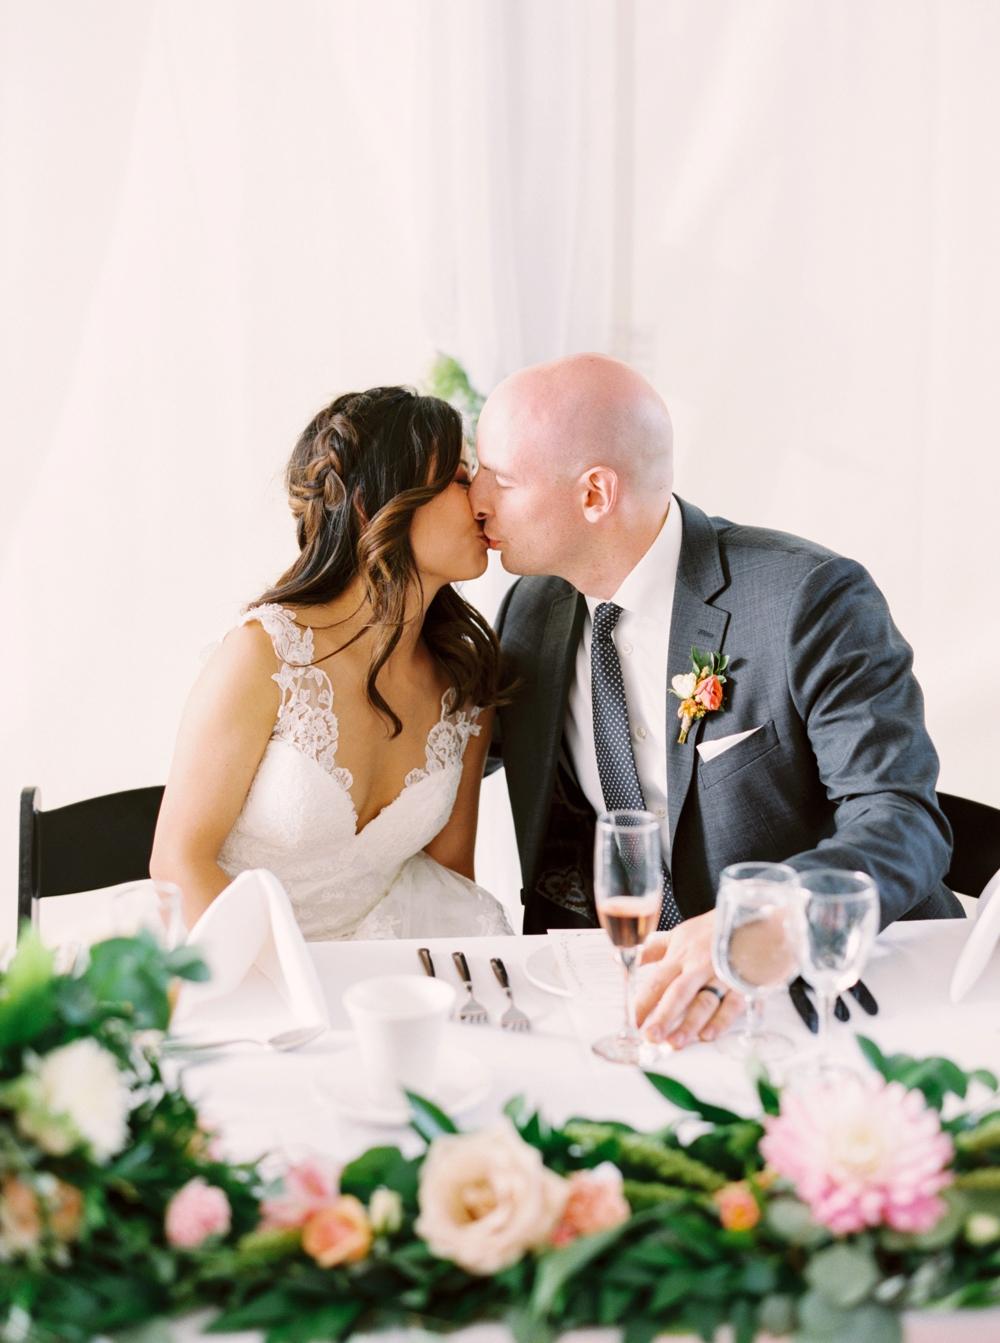 Calgary Wedding Photographer | Meadow Muse Pavilion Wedding | Canmore Photographers | Fish Creek Park Tent Wedding | Bride and groom kiss